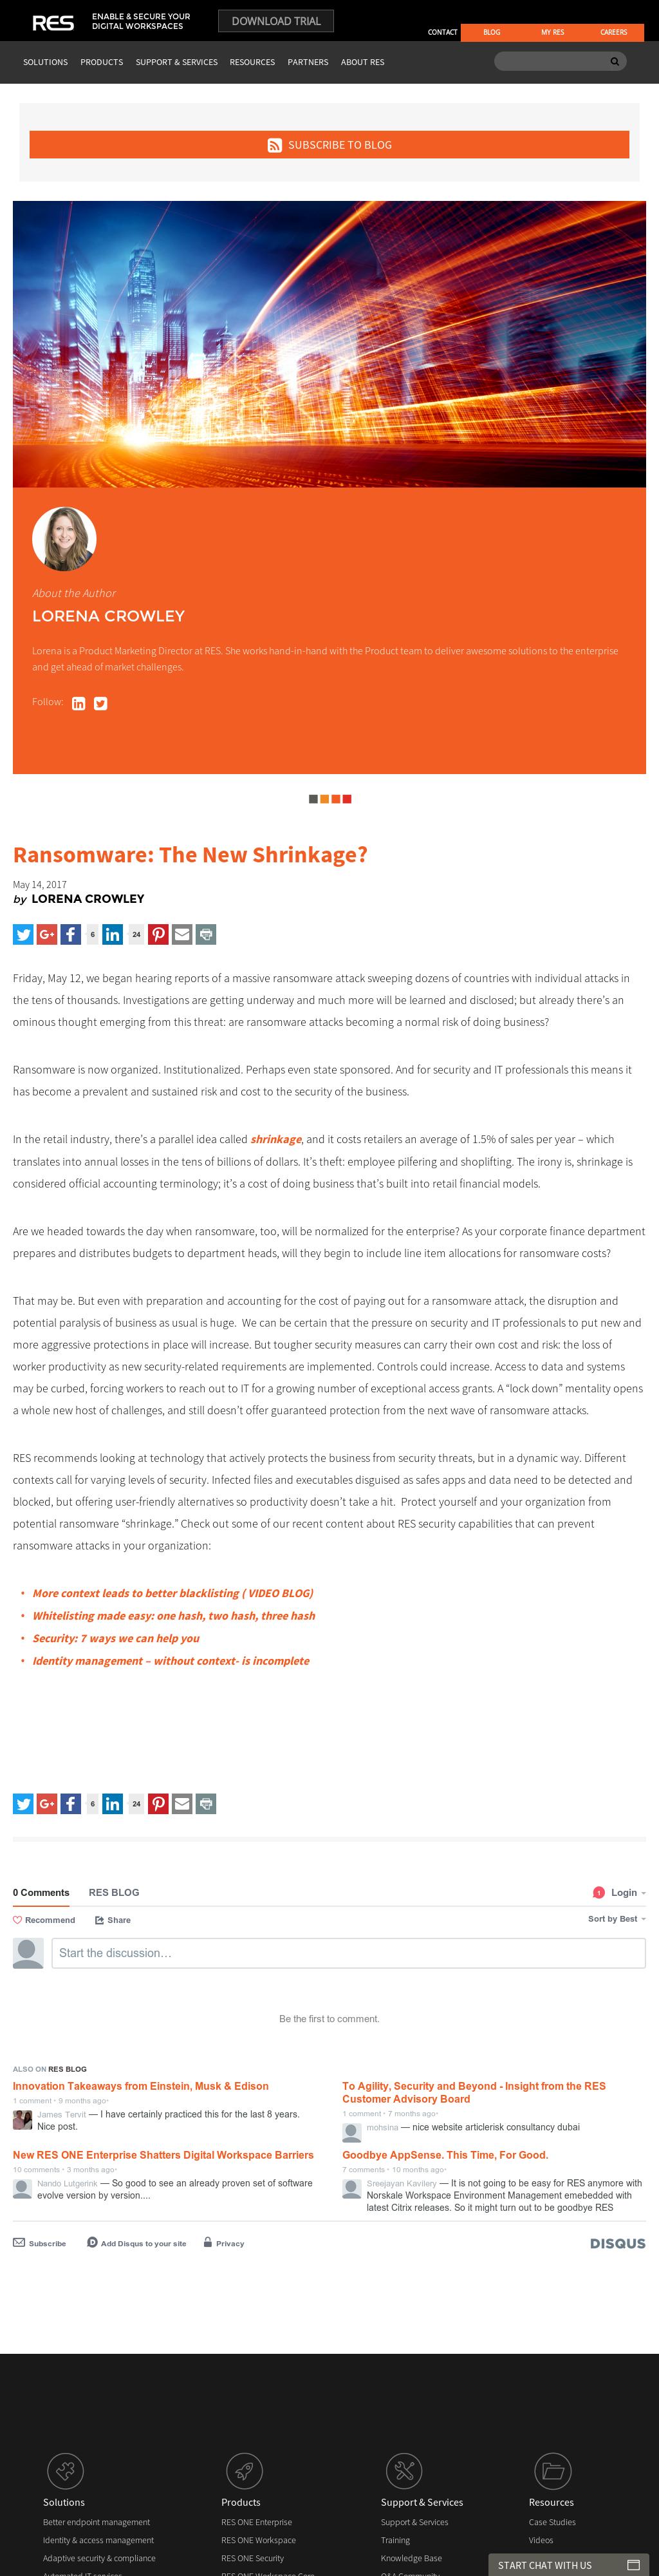 [Blog] Ransomware: The New Shrinkage?